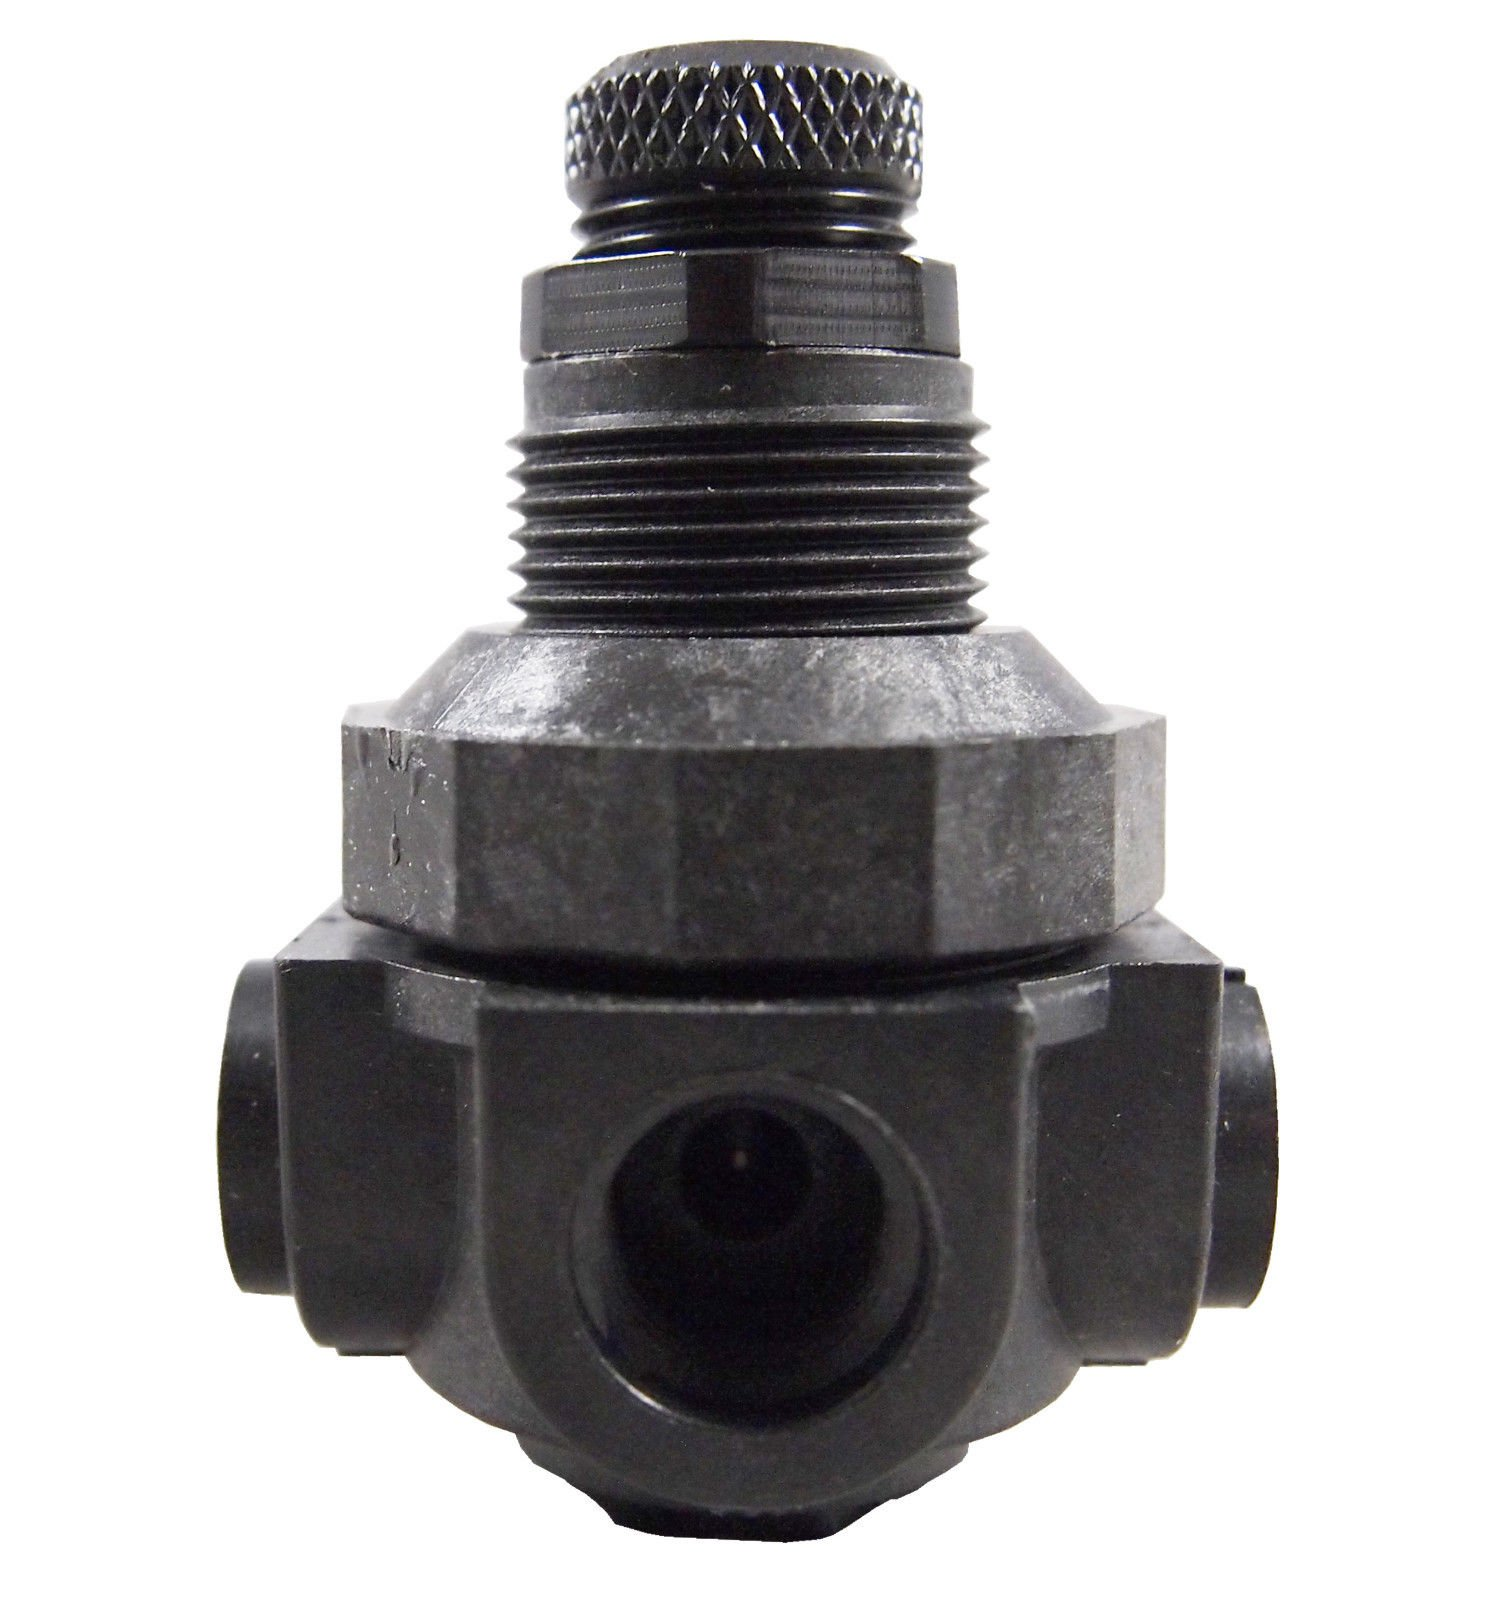 Watts P60 Water Pressure Regulator Plastic 1/4 FNPT - 0 - 125 psi (1-PR60)